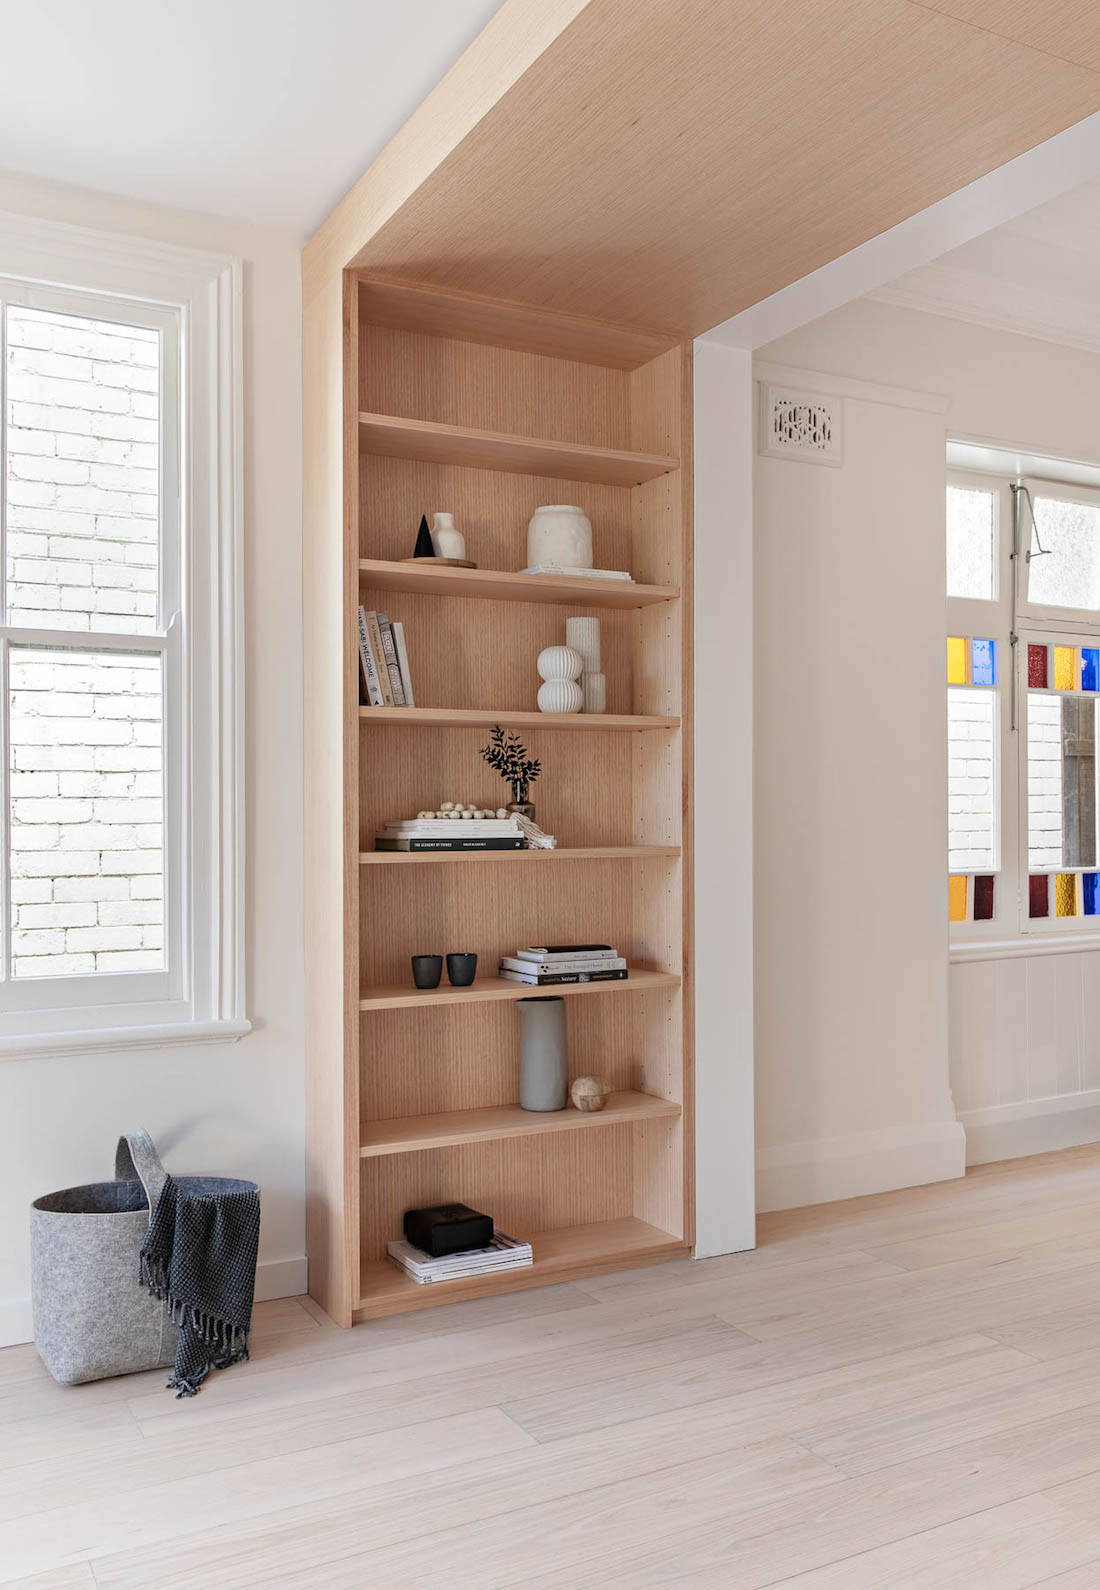 Timber bulkhead bookshelf